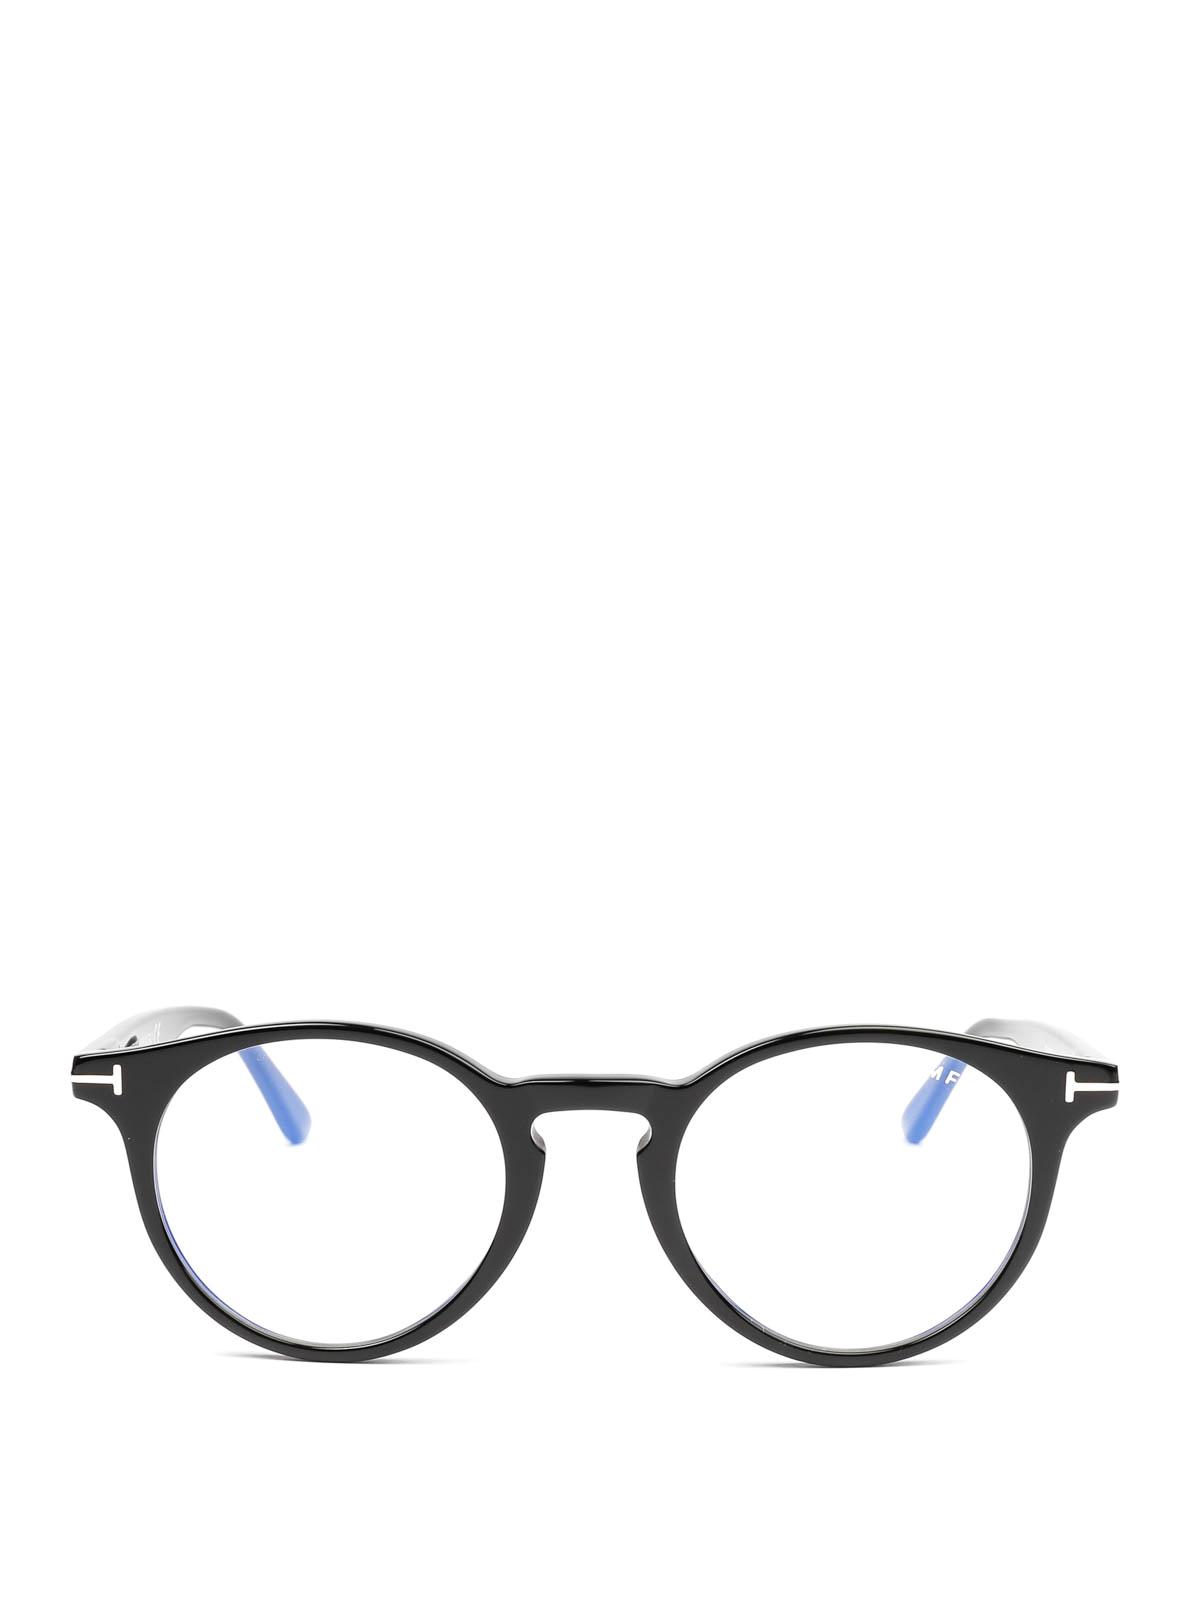 560daf2ce Tom Ford - Black round glasses - glasses - FT5557B001   iKRIX.com